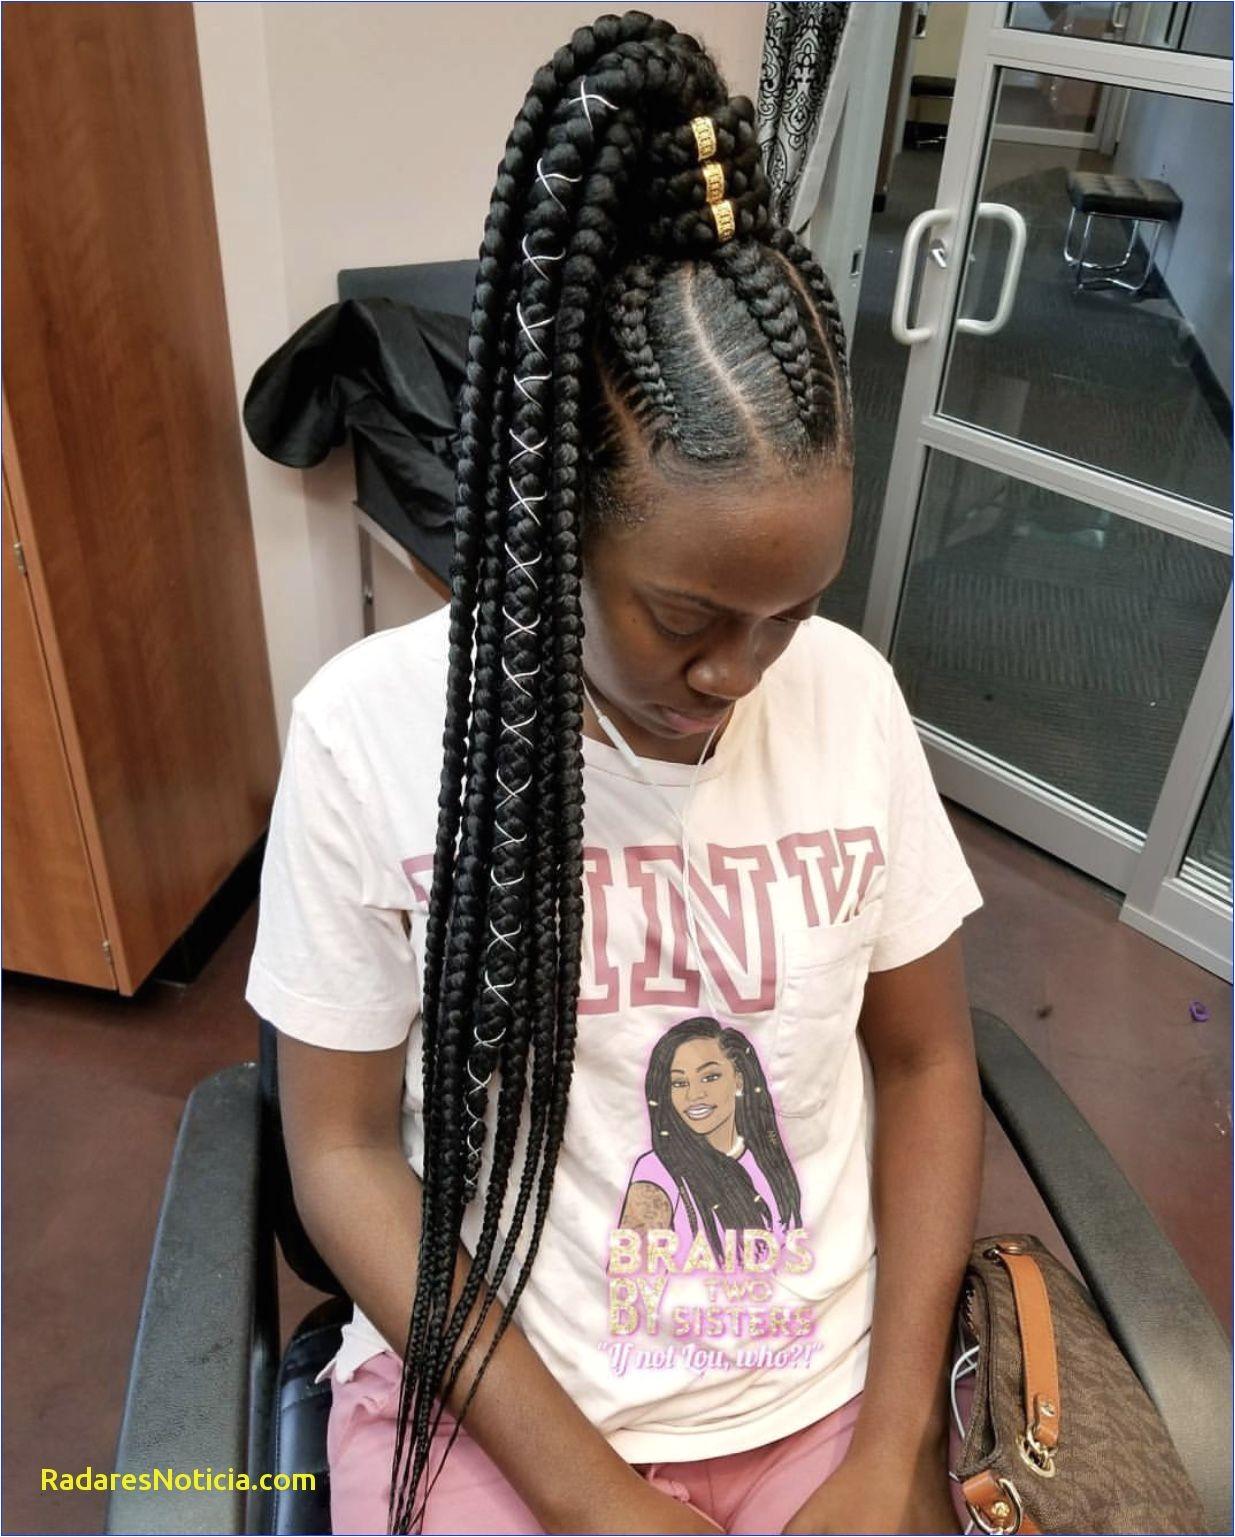 12 year olds Braids Cornrows Kid Braids Plaits Ghana Braids Black Girls Hairstyles Woman Hairstyles Long Hairstyles Black Braided